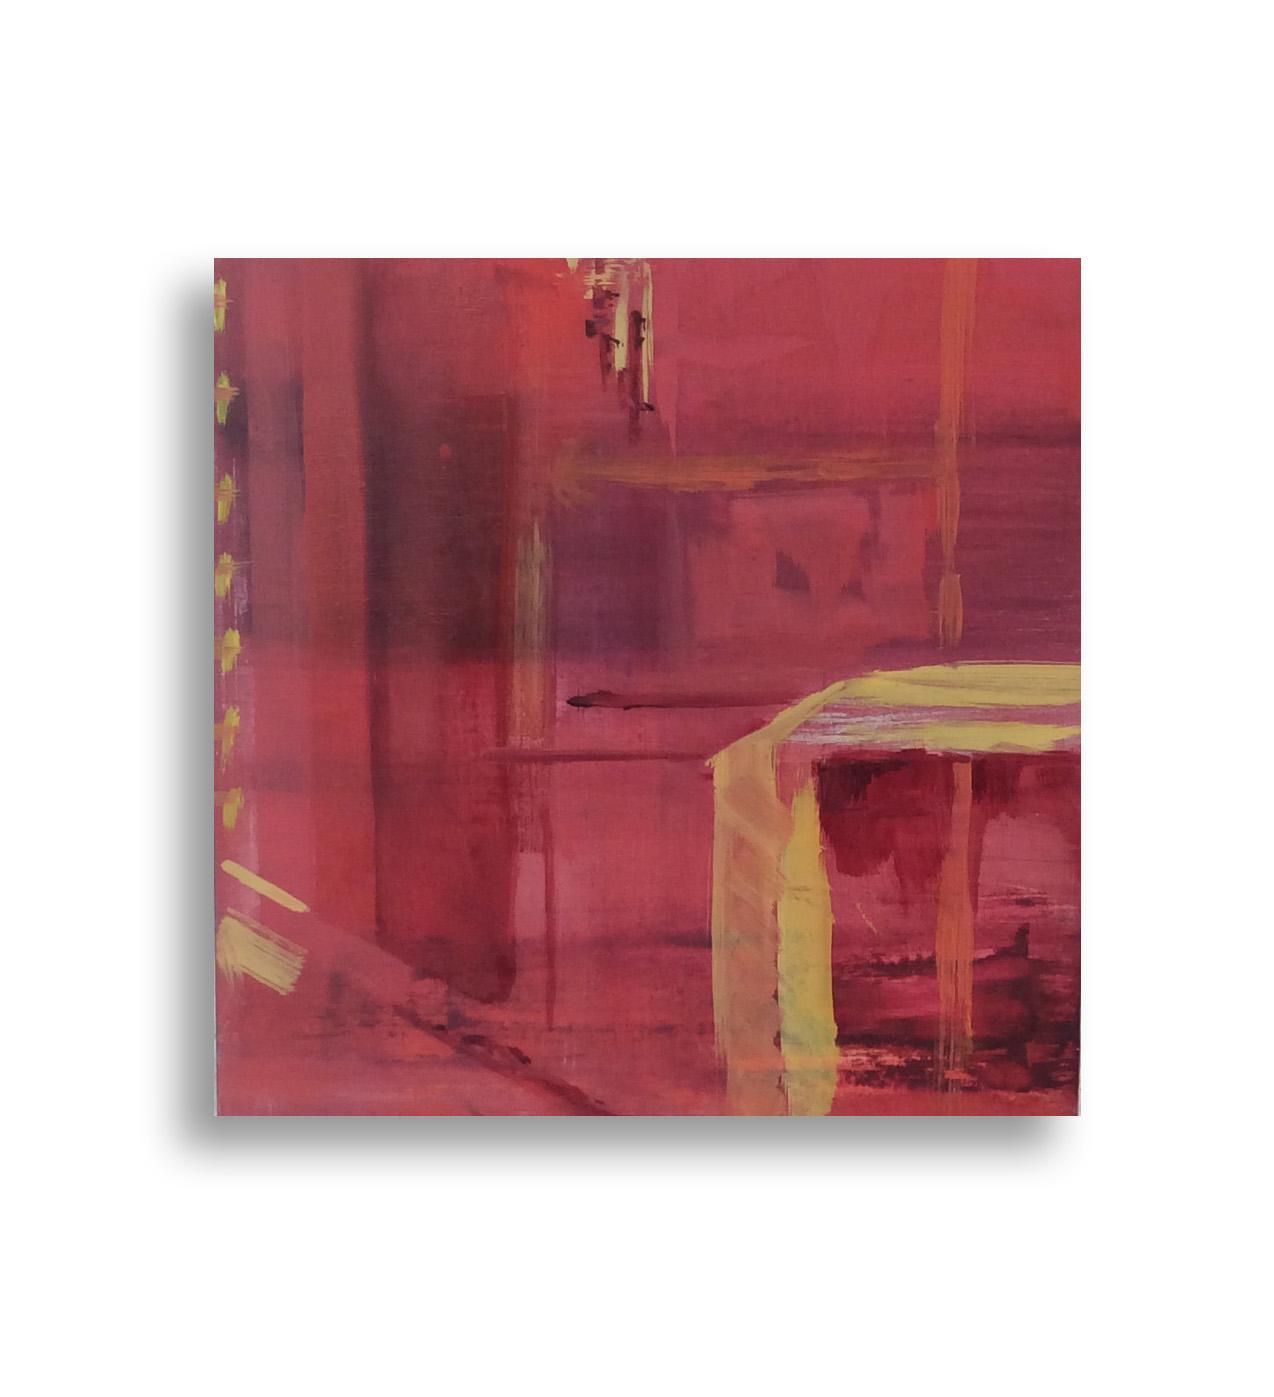 Studio red